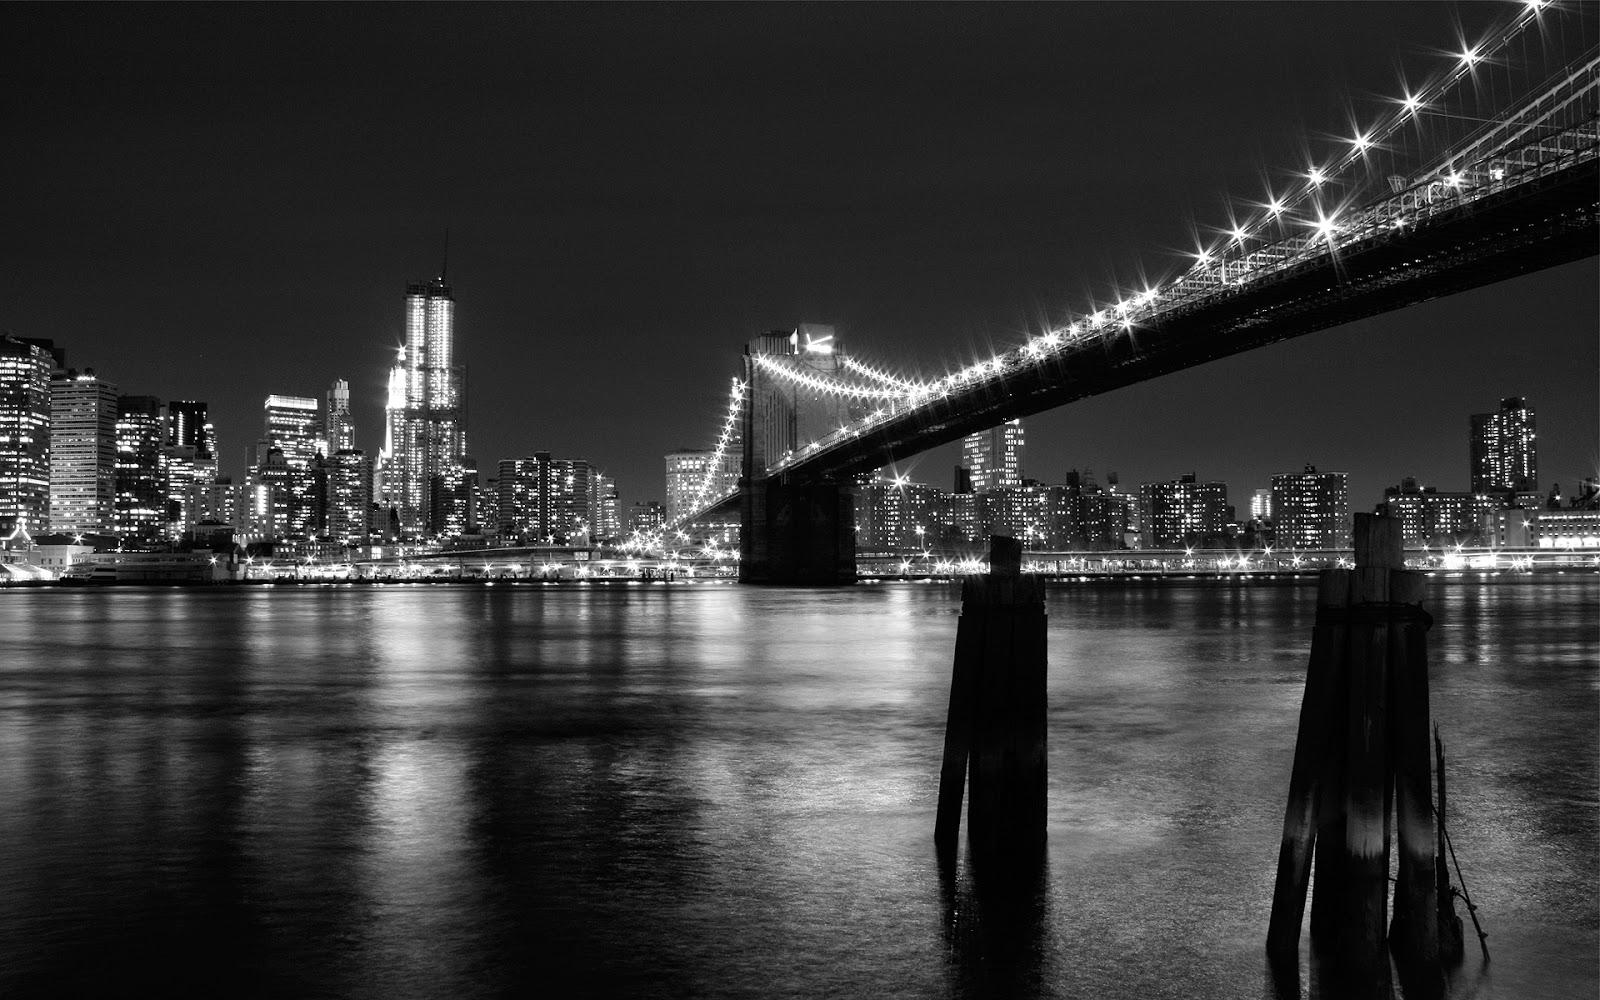 Night City Widescreen